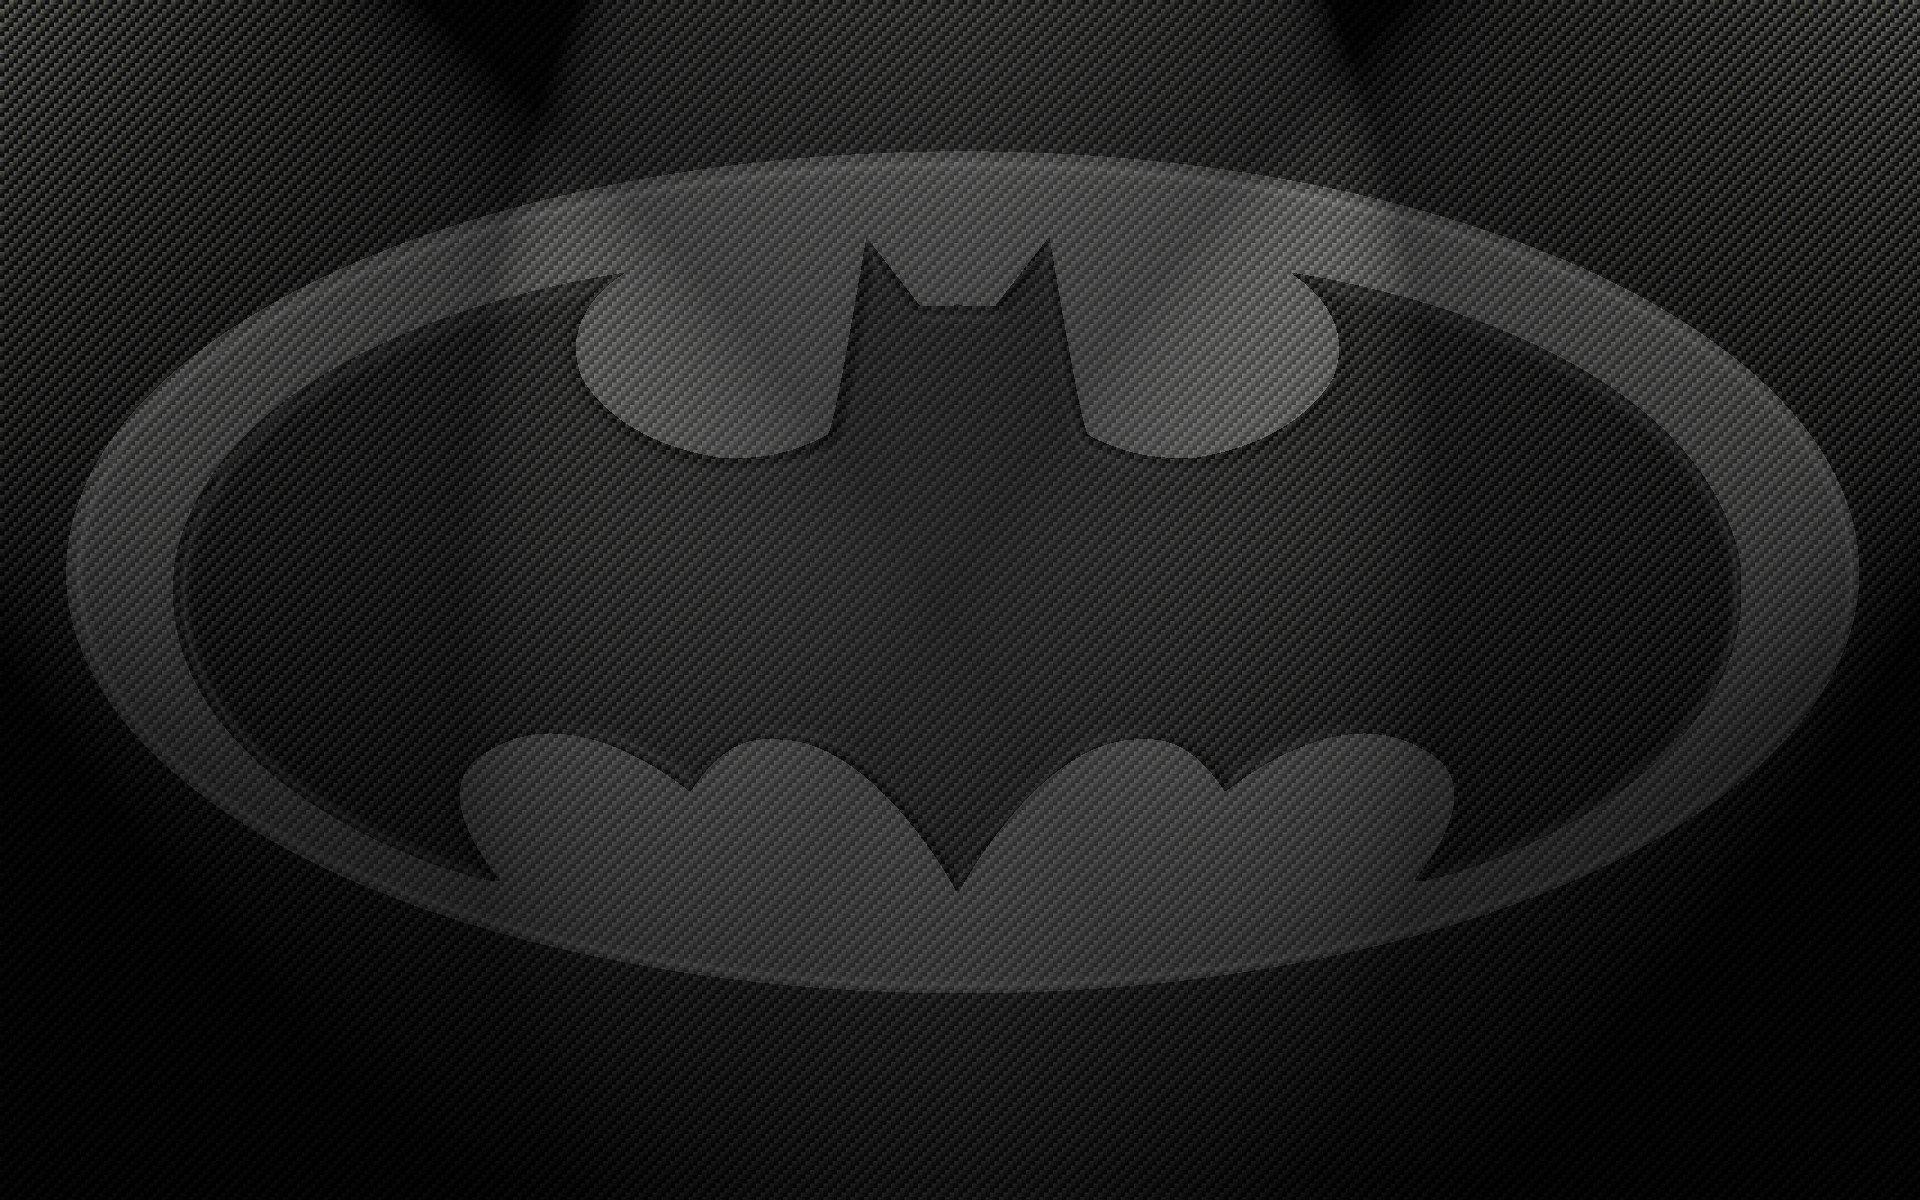 batman carbon fiber backgrounds download (With images